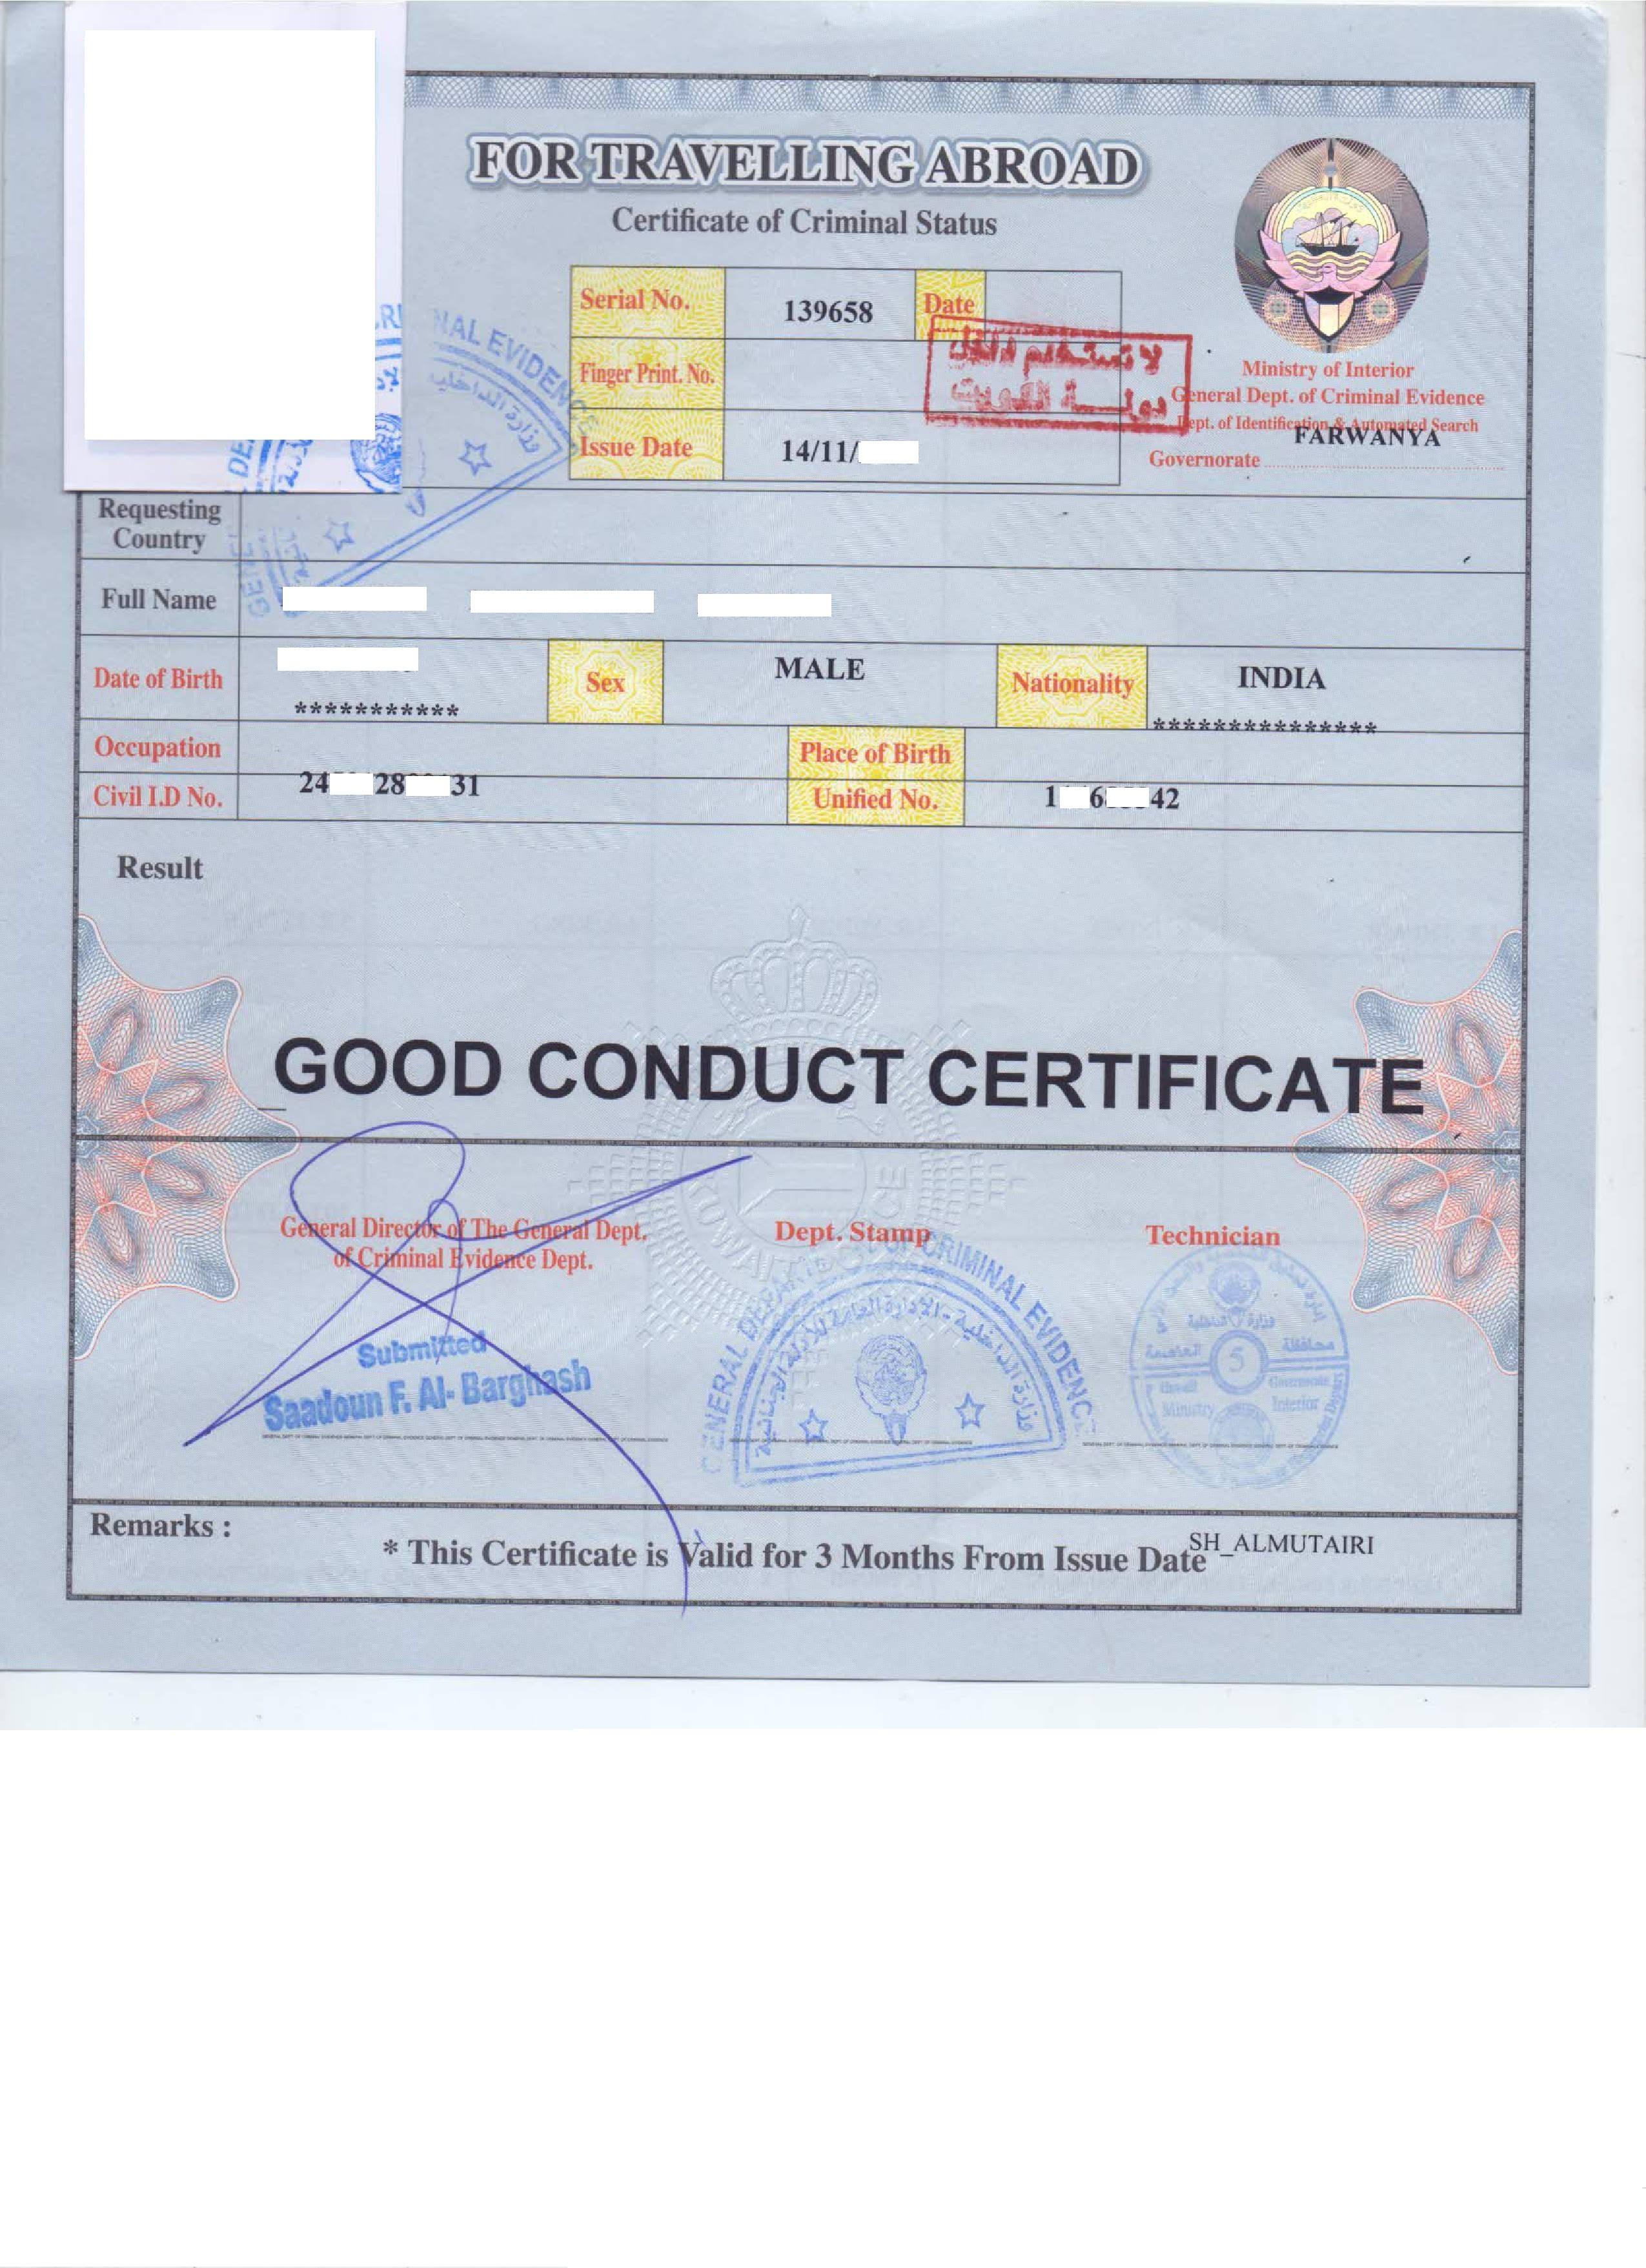 Police Clearance Certificate Kuwait, Delhi, Mumbai